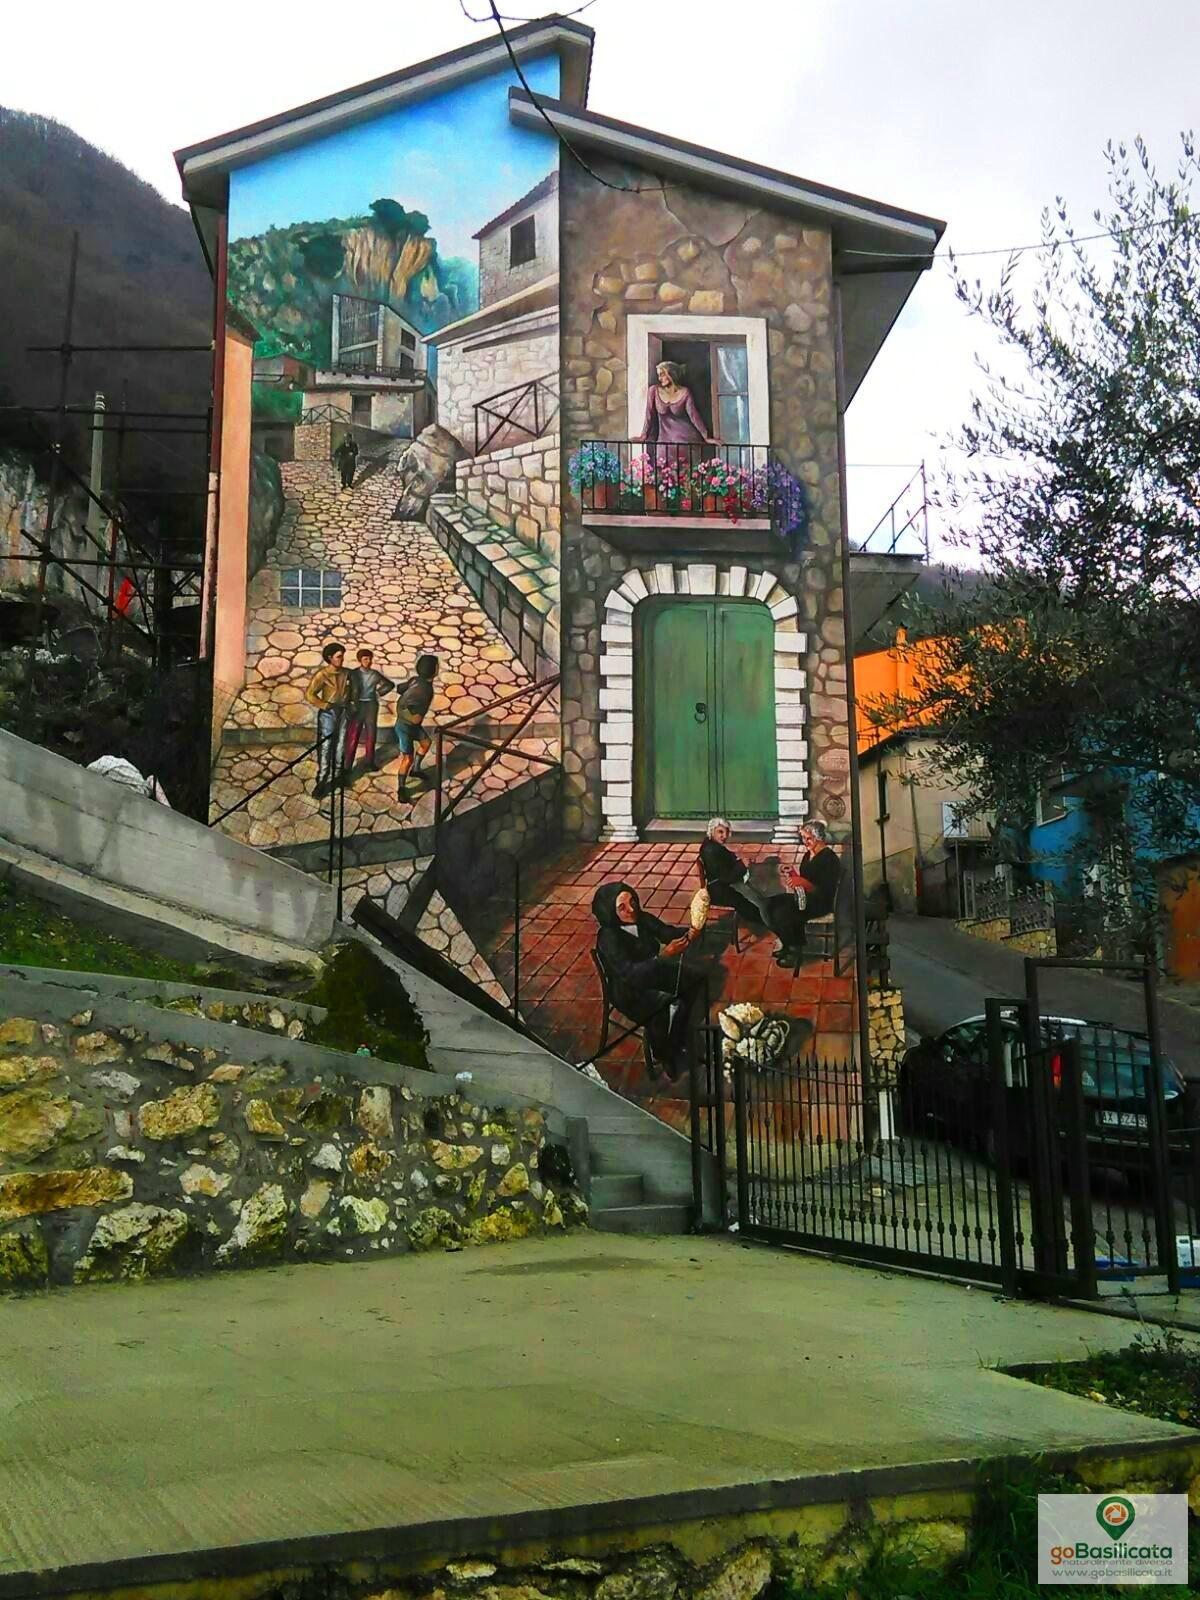 La filatura della lana - I murales di Sant'Angelo le Fratte